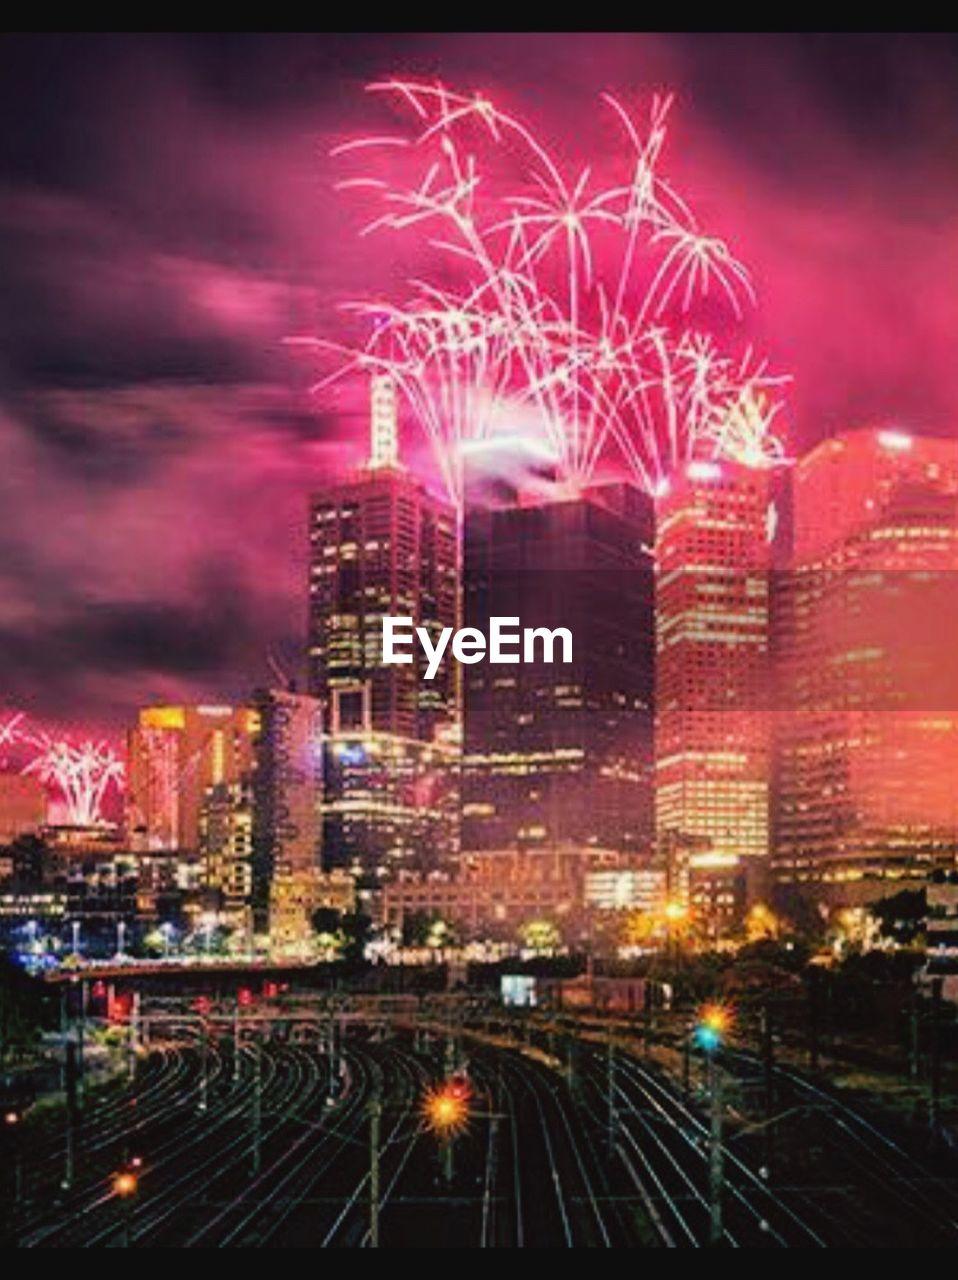 night, illuminated, cityscape, city, skyscraper, building exterior, city life, urban skyline, architecture, long exposure, outdoors, travel destinations, sky, no people